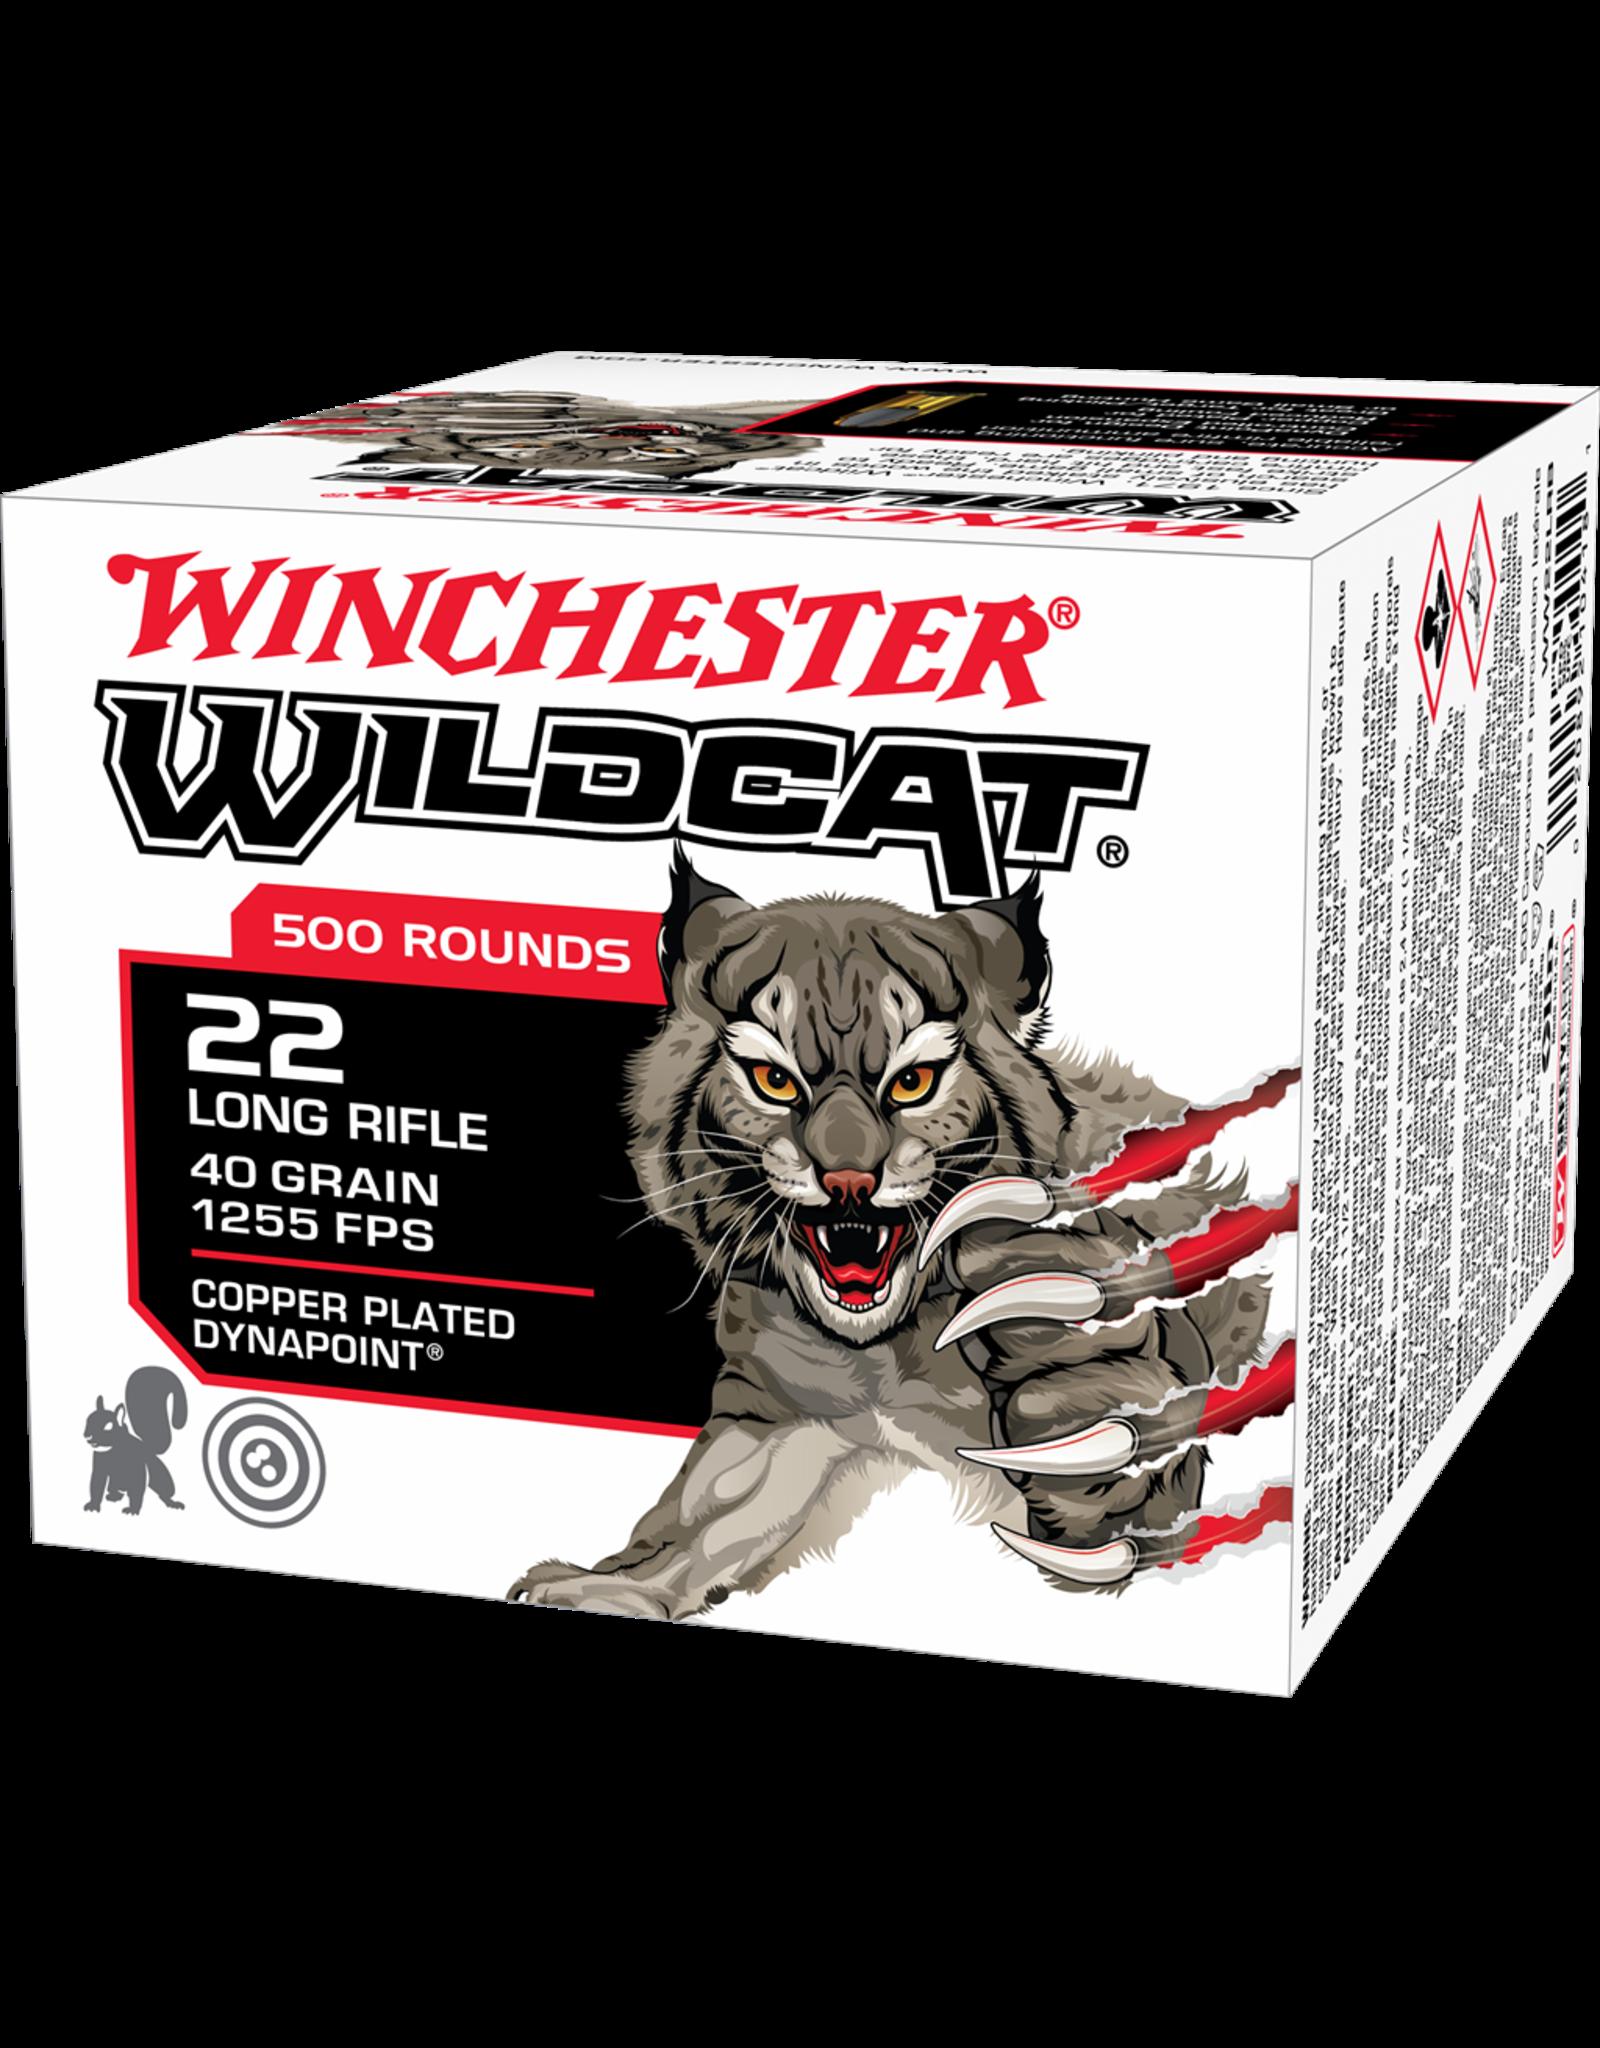 WINCHESTER - AMMUNITION Winchester Wildcat Rimfire 22 Long Rifle, 40 Grain, 50 rds single